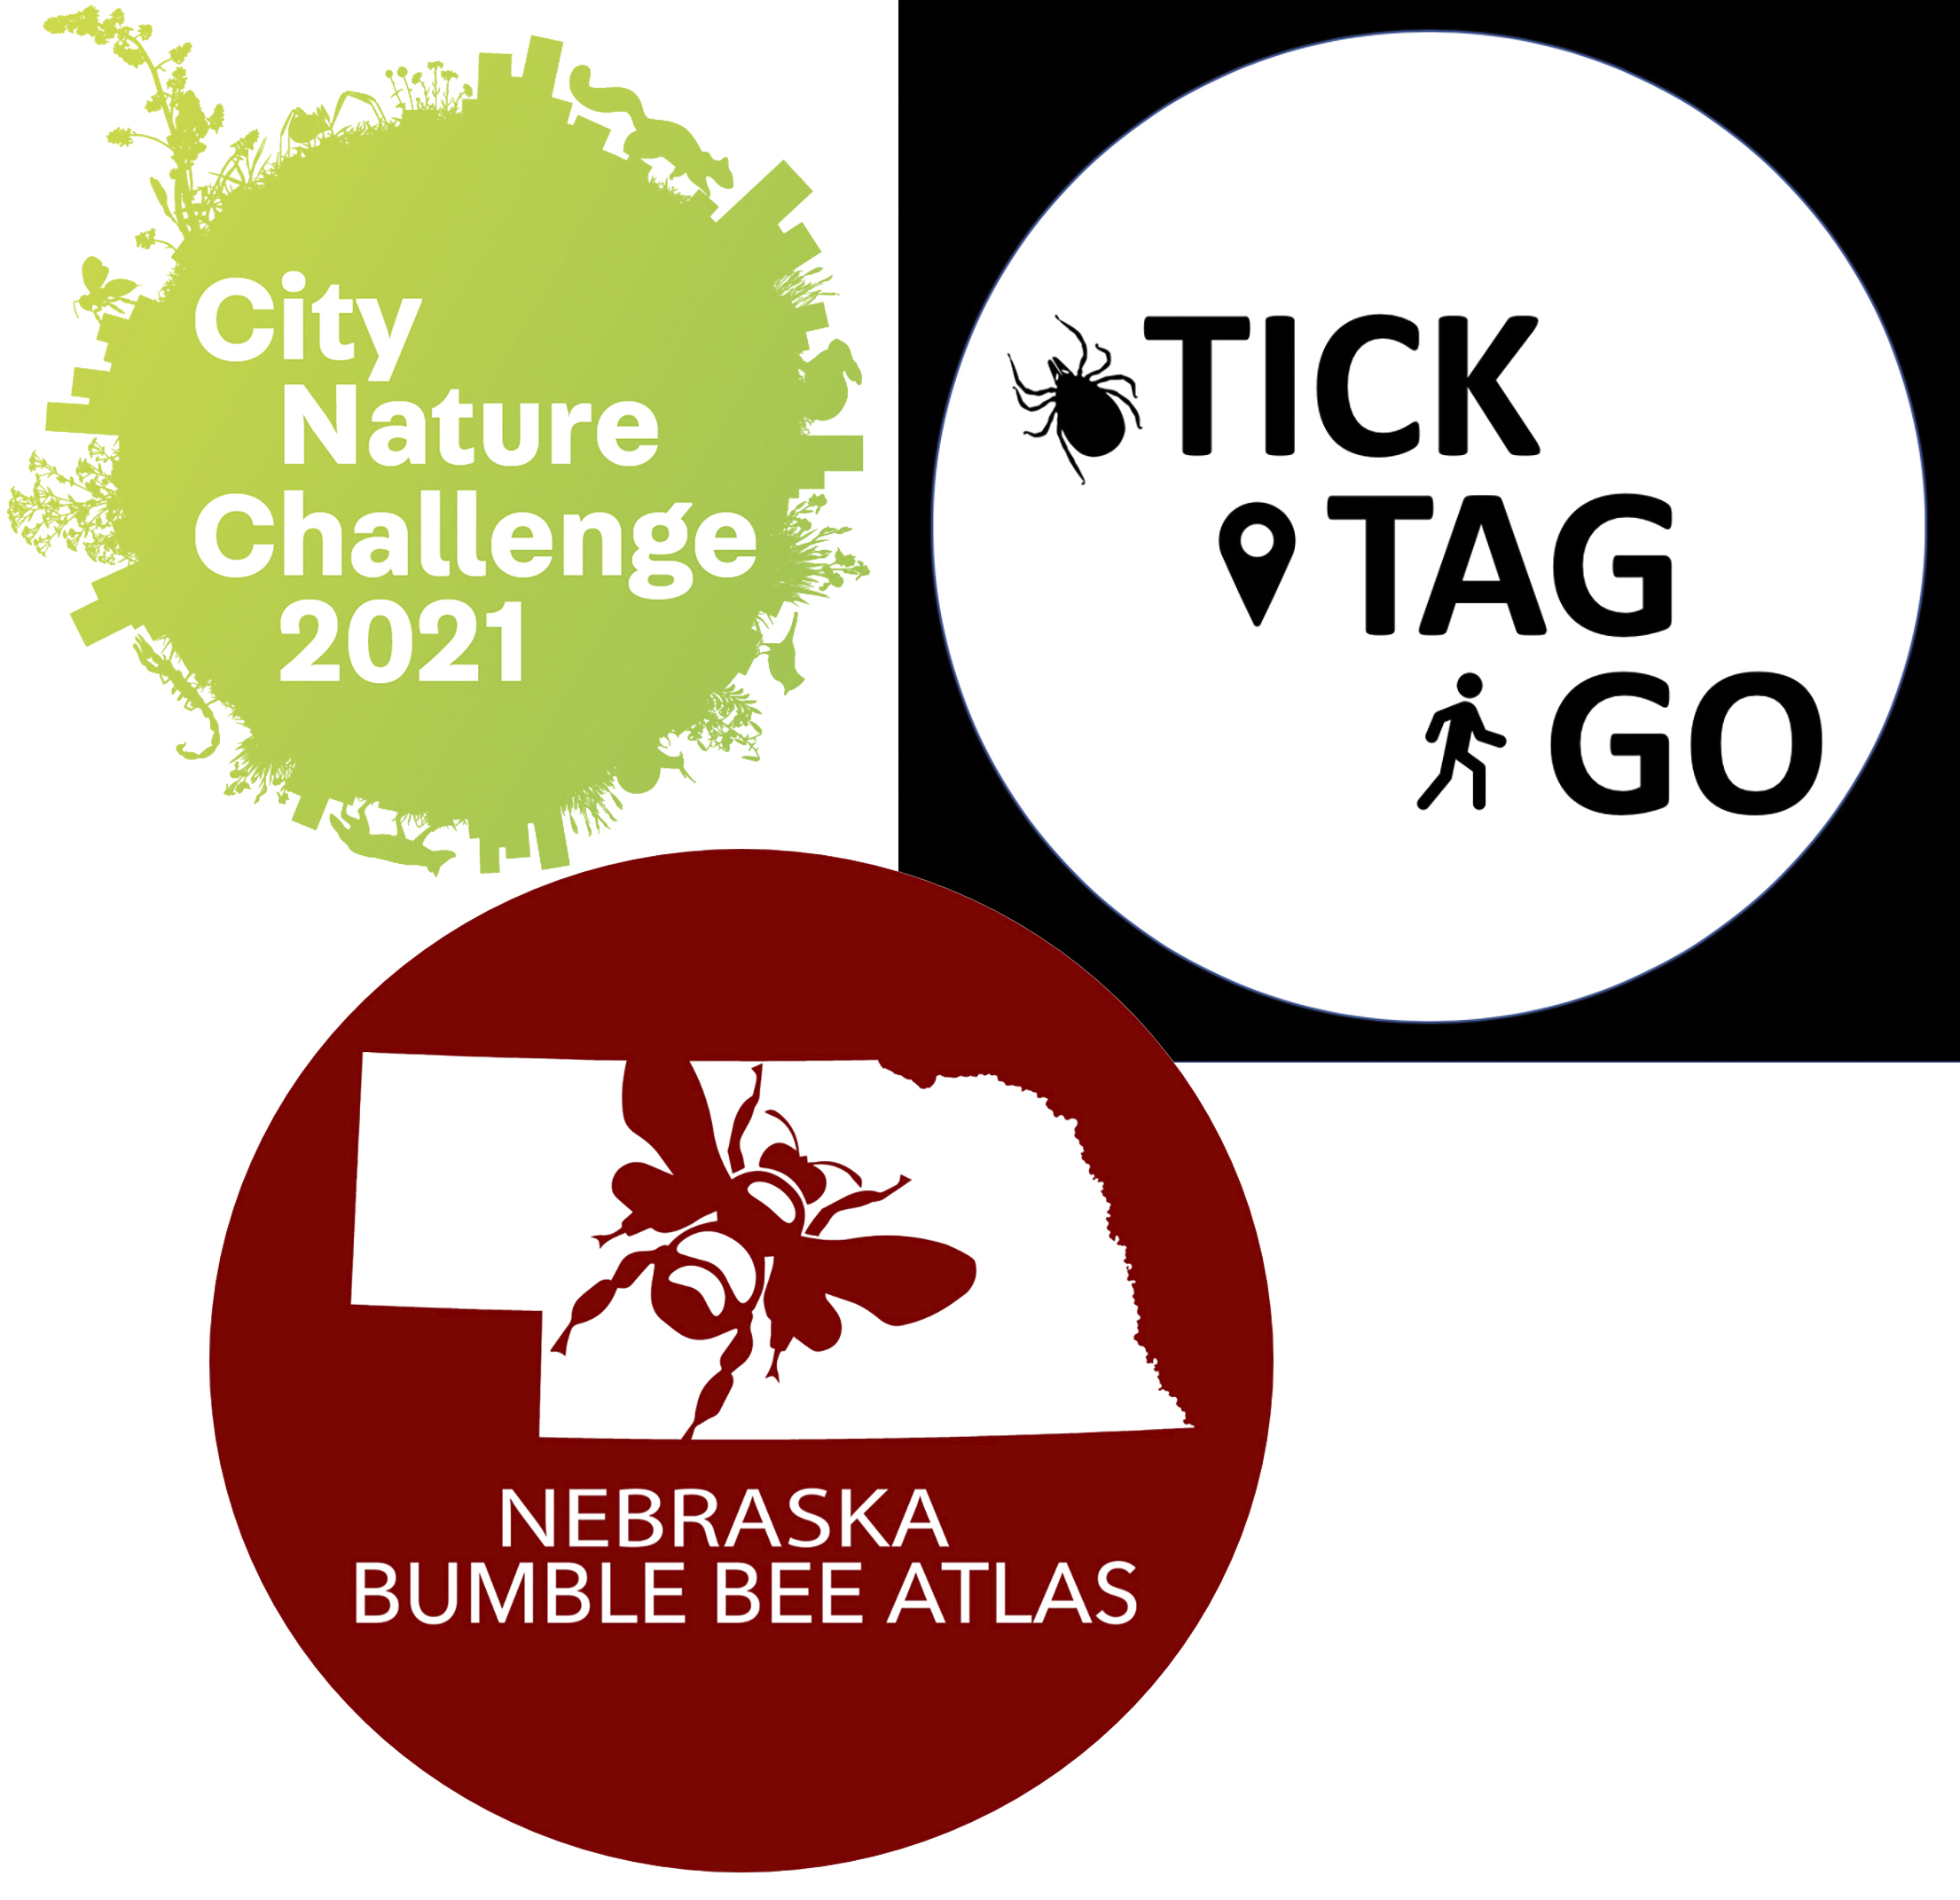 Lincoln City Nature Challenge — Nebraska Game & Parks, Tick Tag Go — IANR, and Nebraska Bumble Bee Atlas — Xerces Society